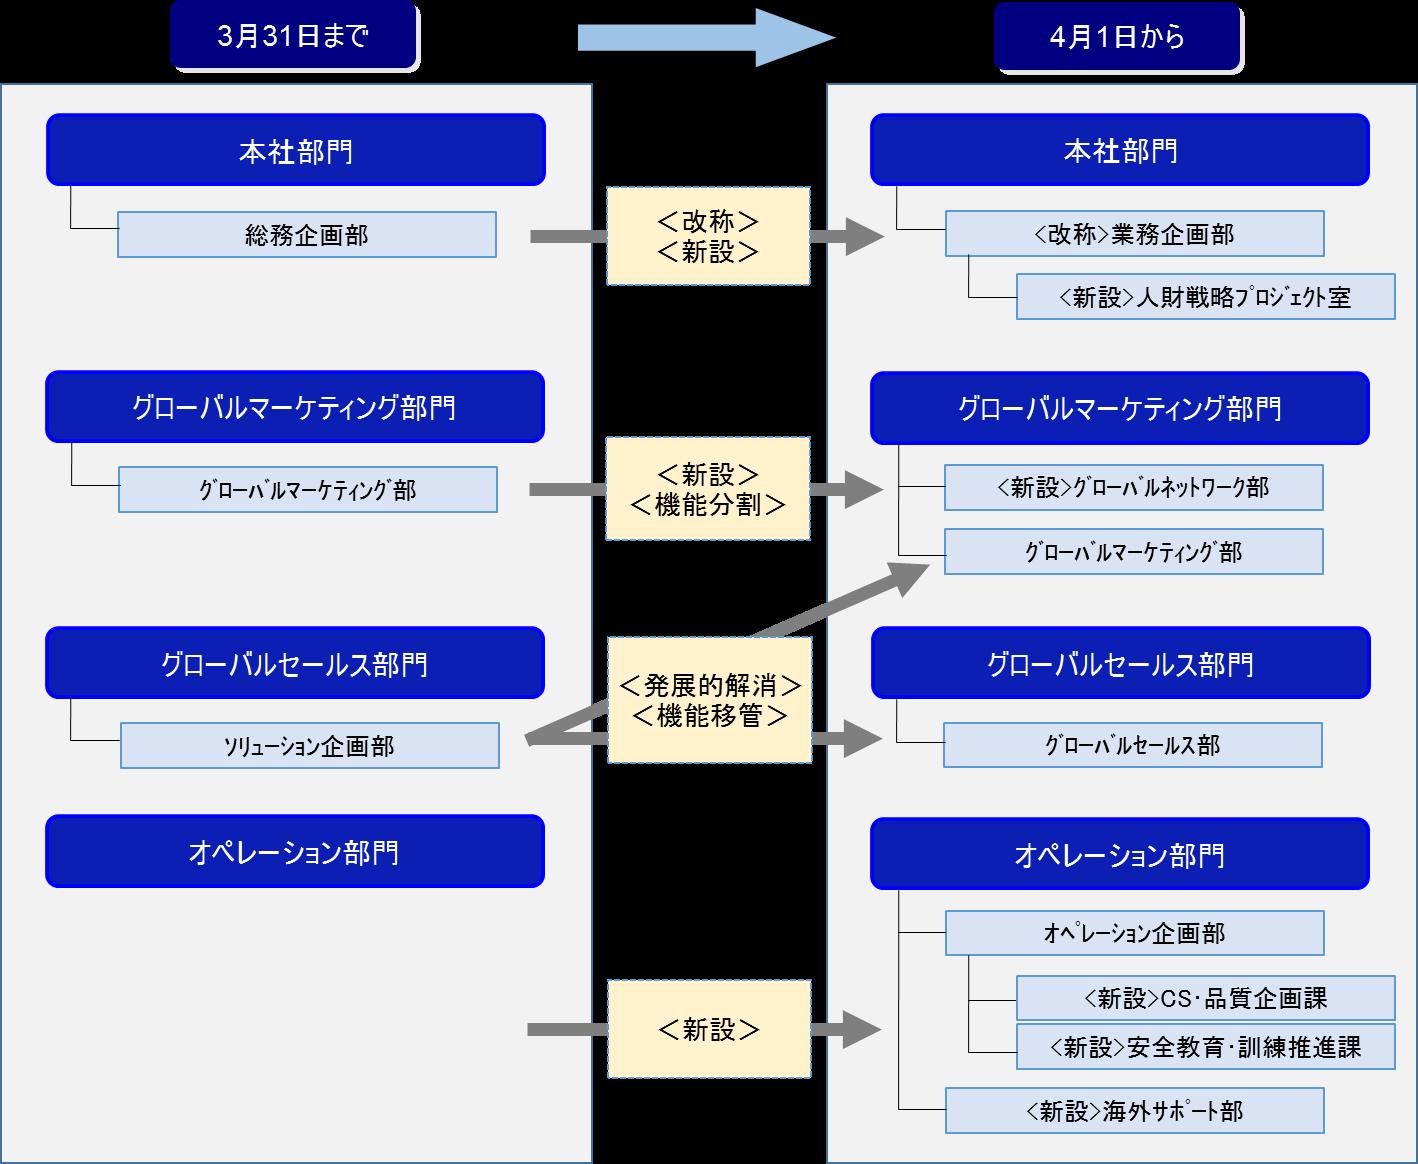 2018組織図.png